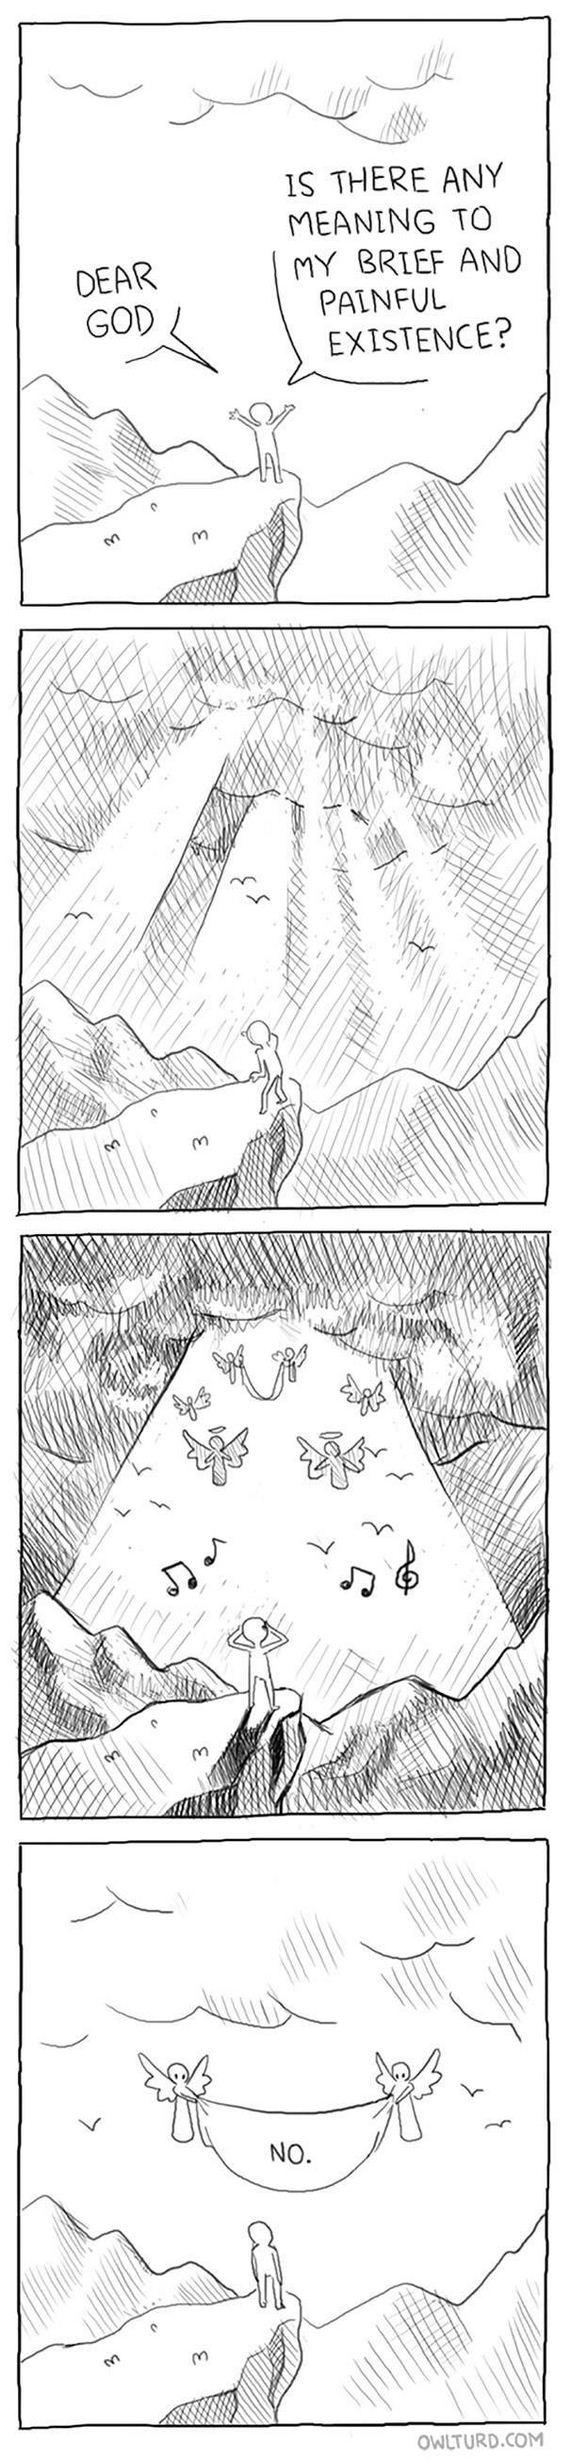 comics_about_life